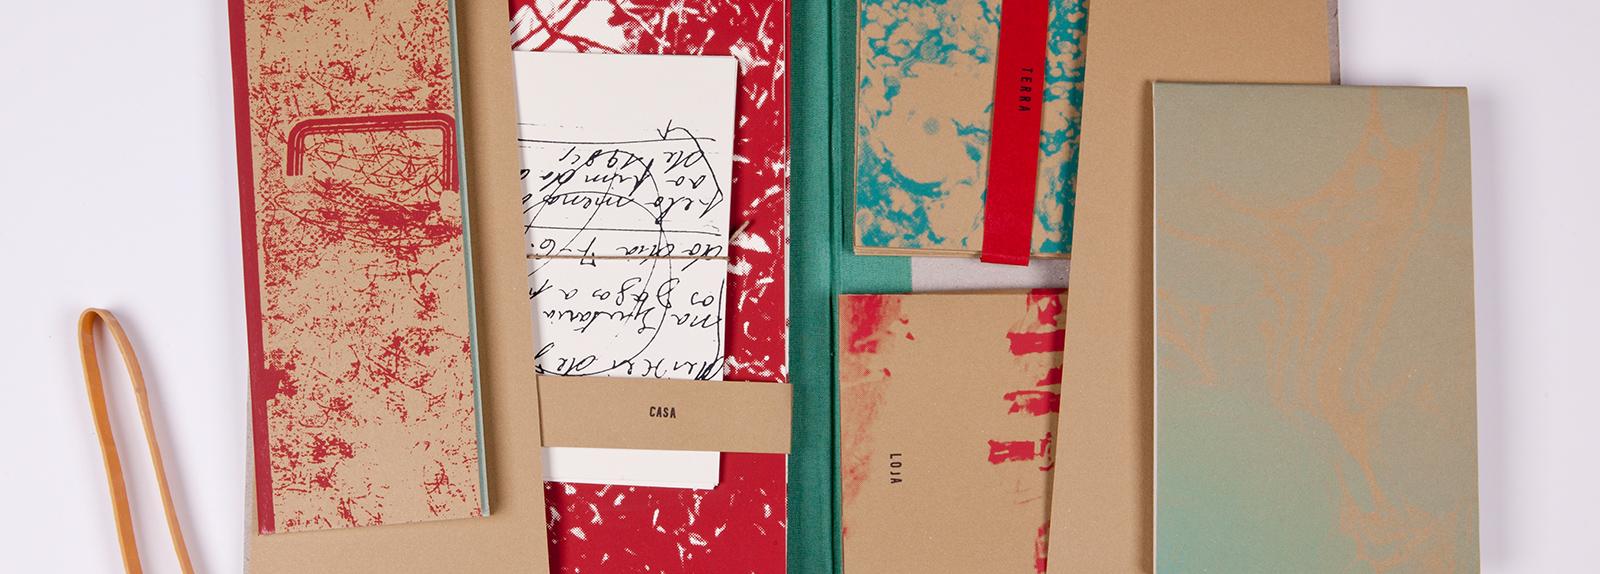 LivrObjecto – Anatomia e Arquitectura